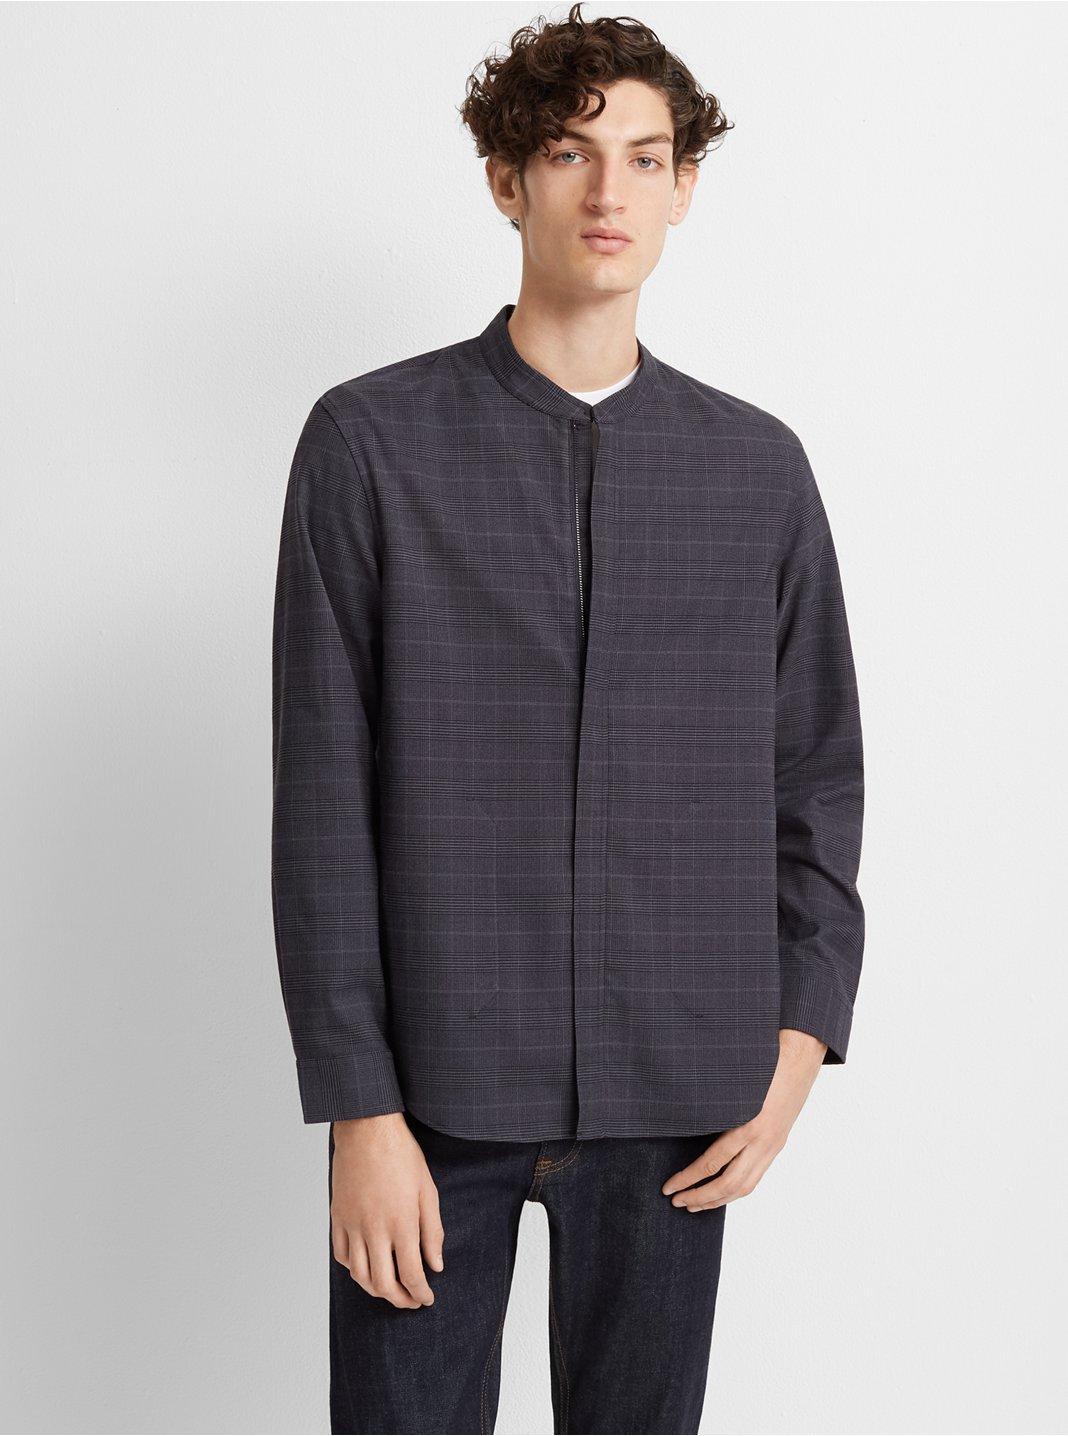 Glen Plaid Zip-Front Shirt